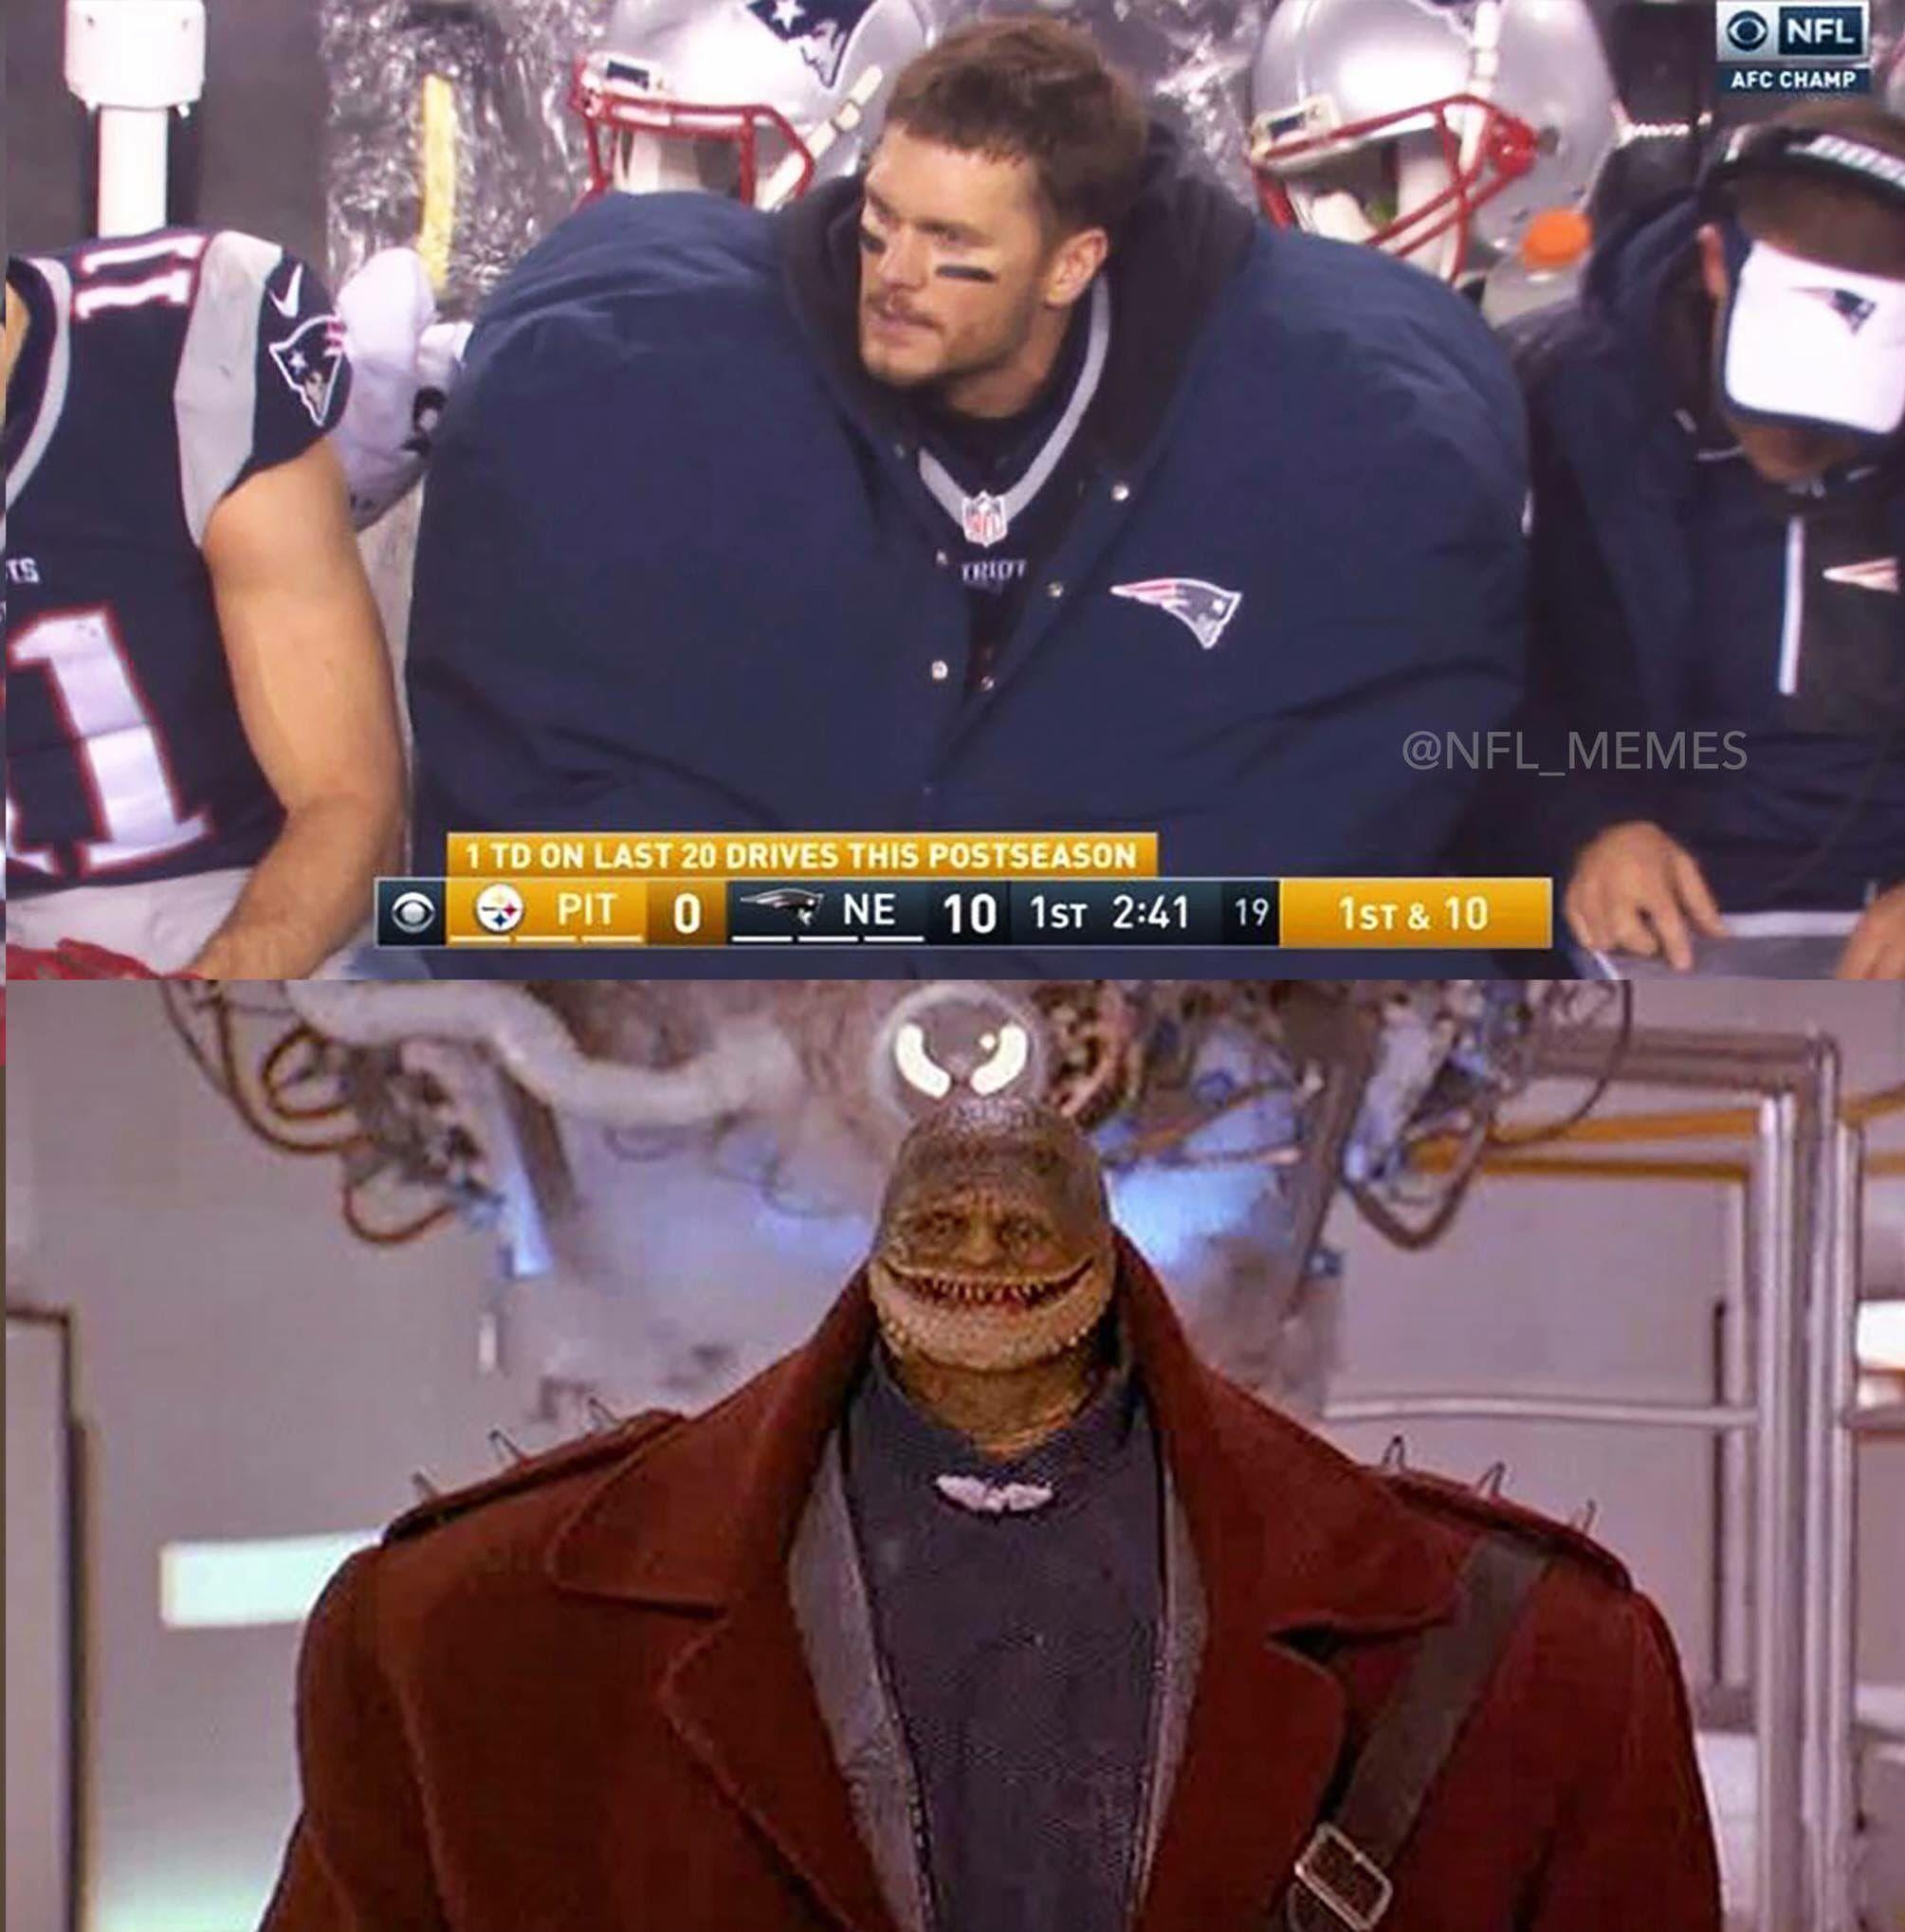 Who Wore It Better? on Random Internet Expertly Trolled Tom Brady